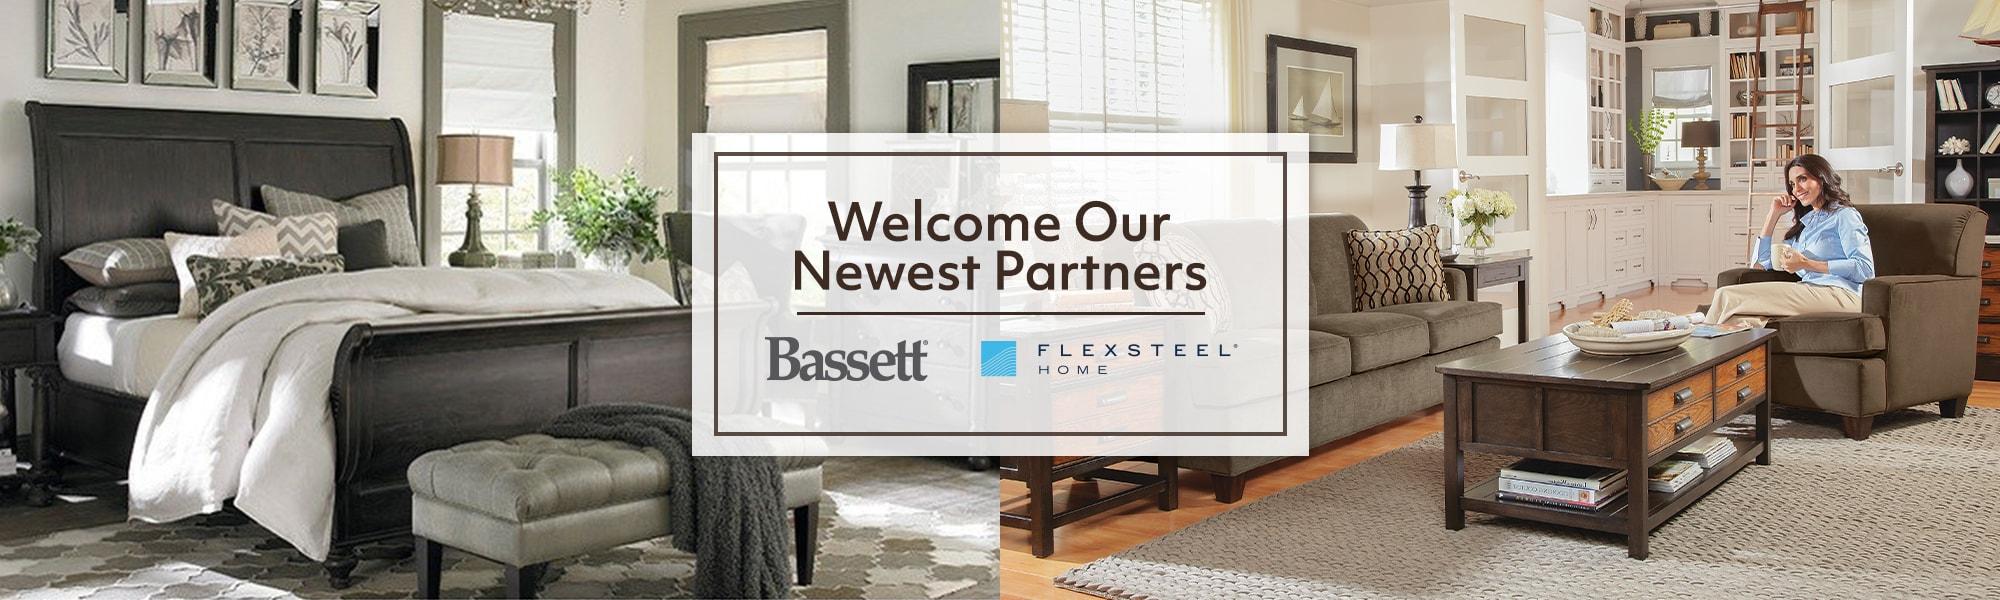 Welcome Bassett and Flexsteel